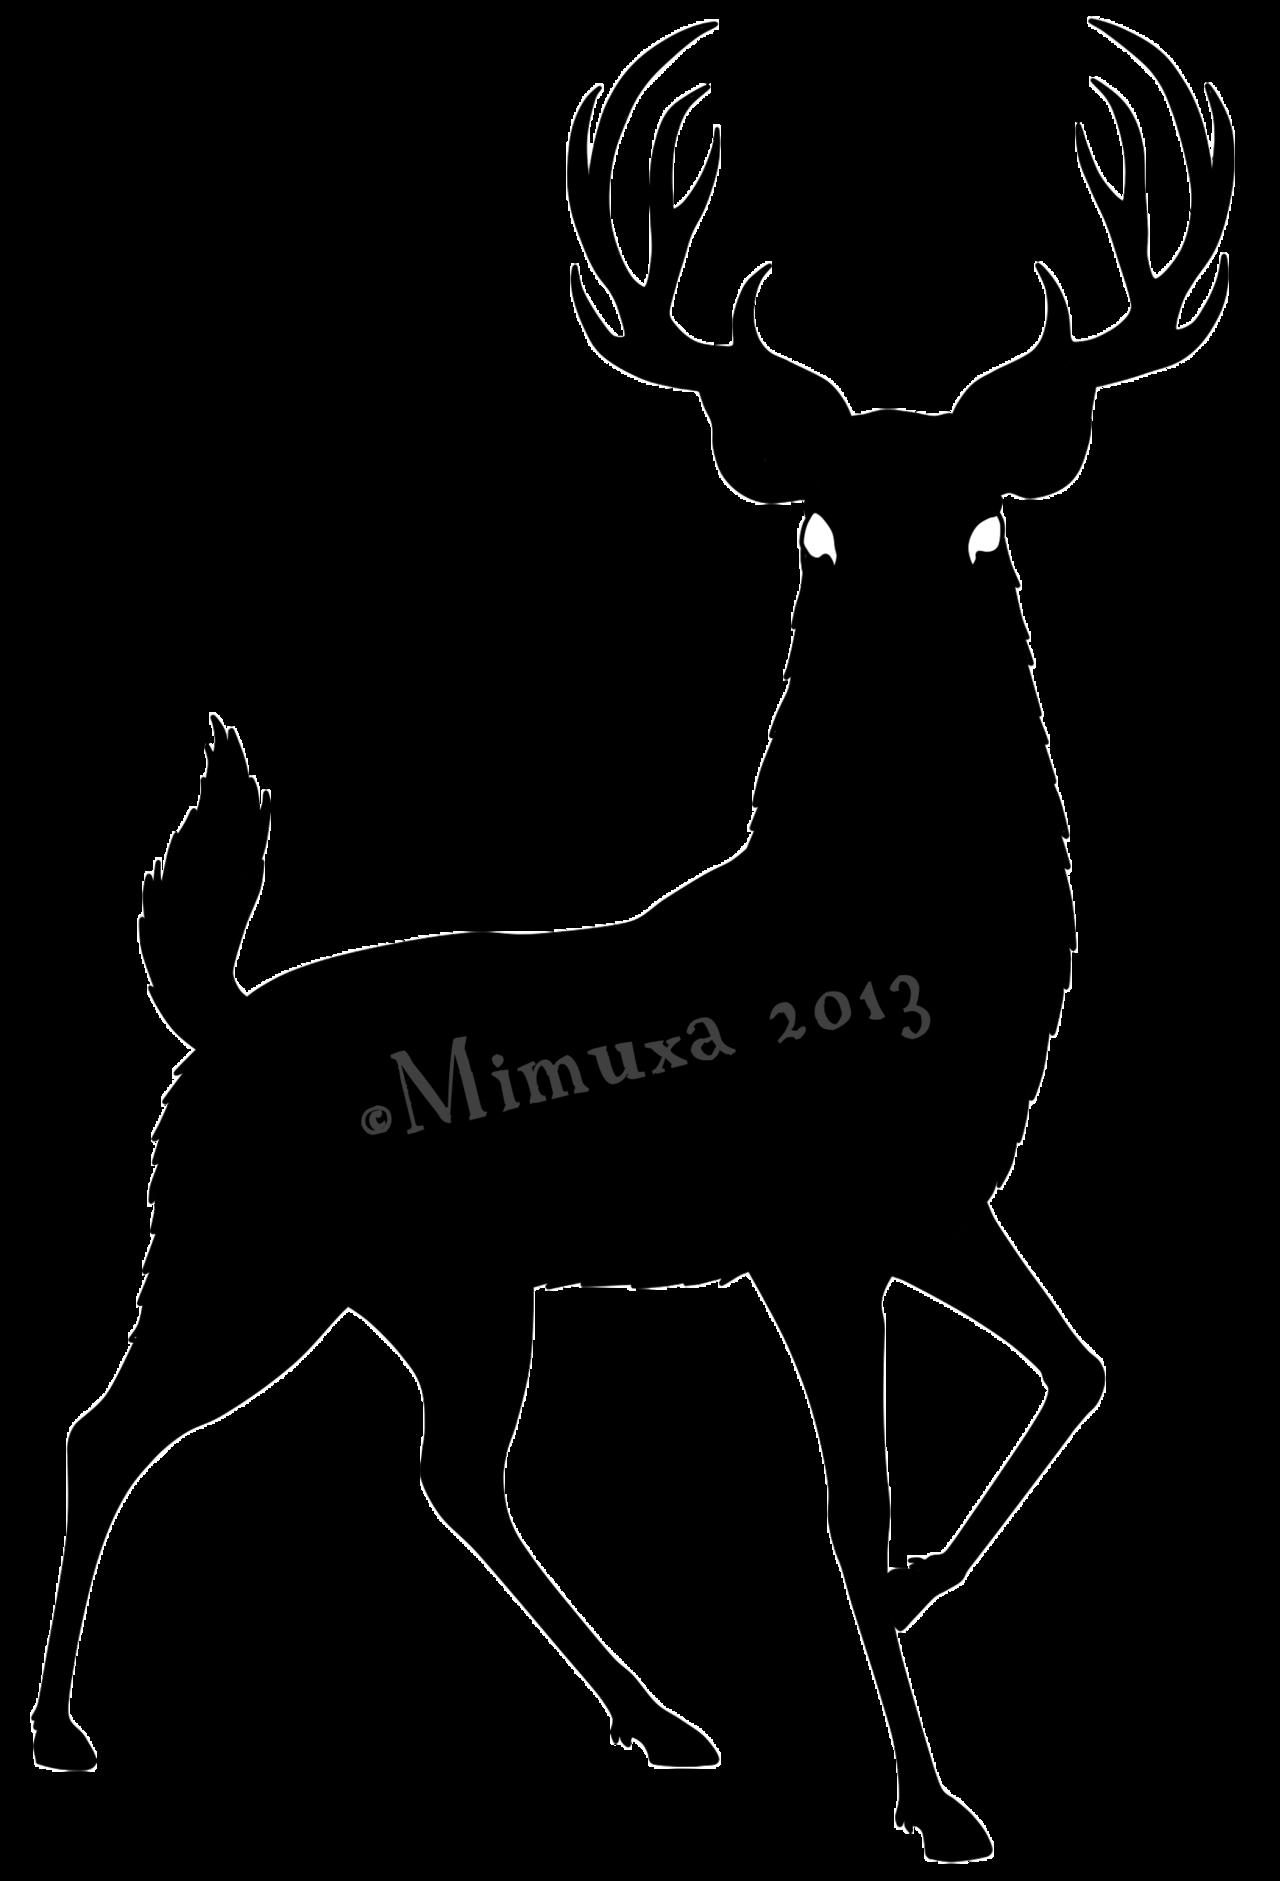 1280x1881 Images Deer Silhouette